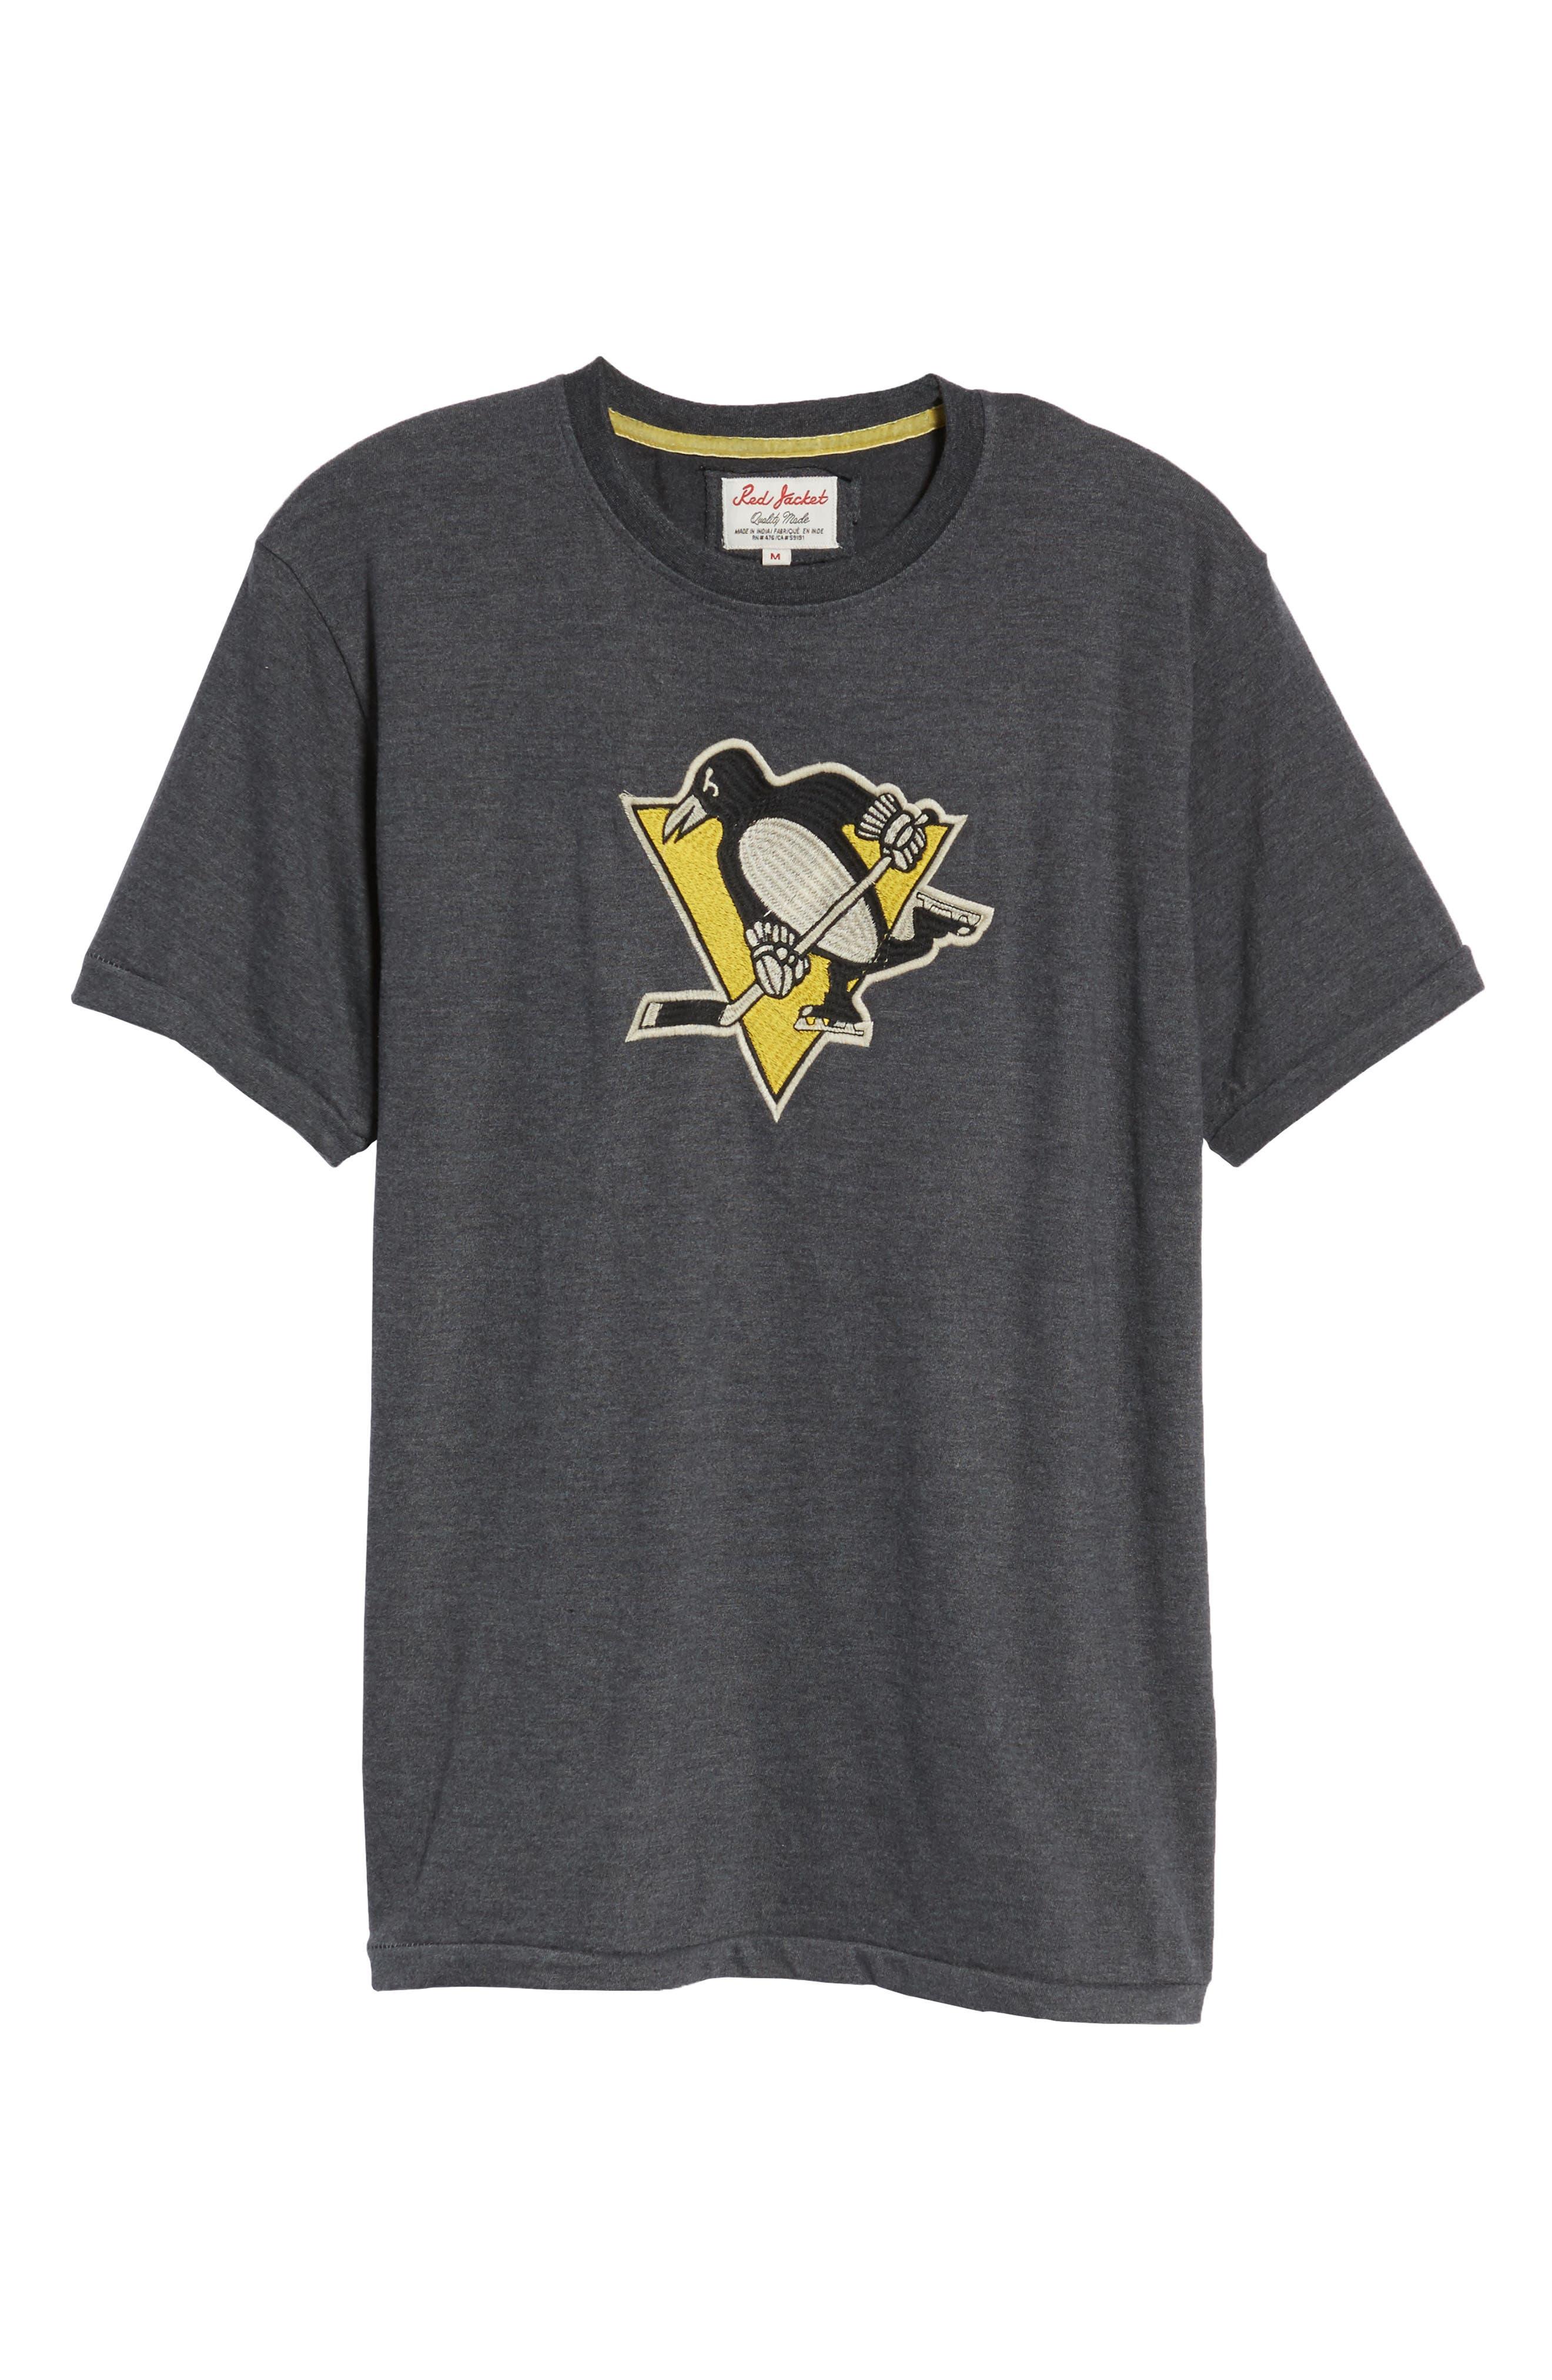 Hillwood Penguins T-Shirt,                             Alternate thumbnail 6, color,                             Heather Black